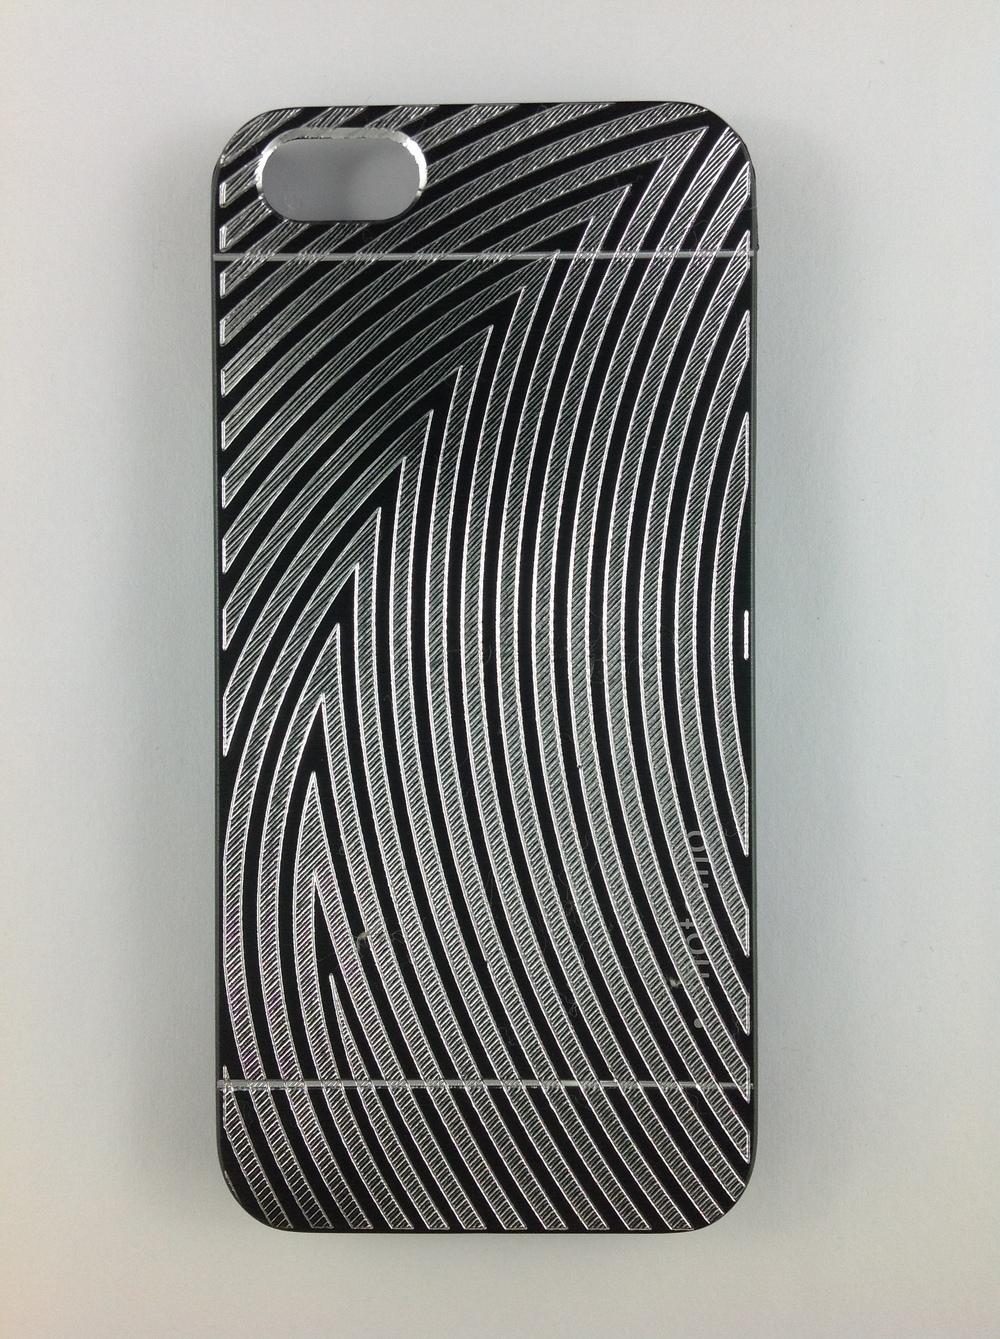 DigitalCarver-iPhone5s-IMG_3686.JPG